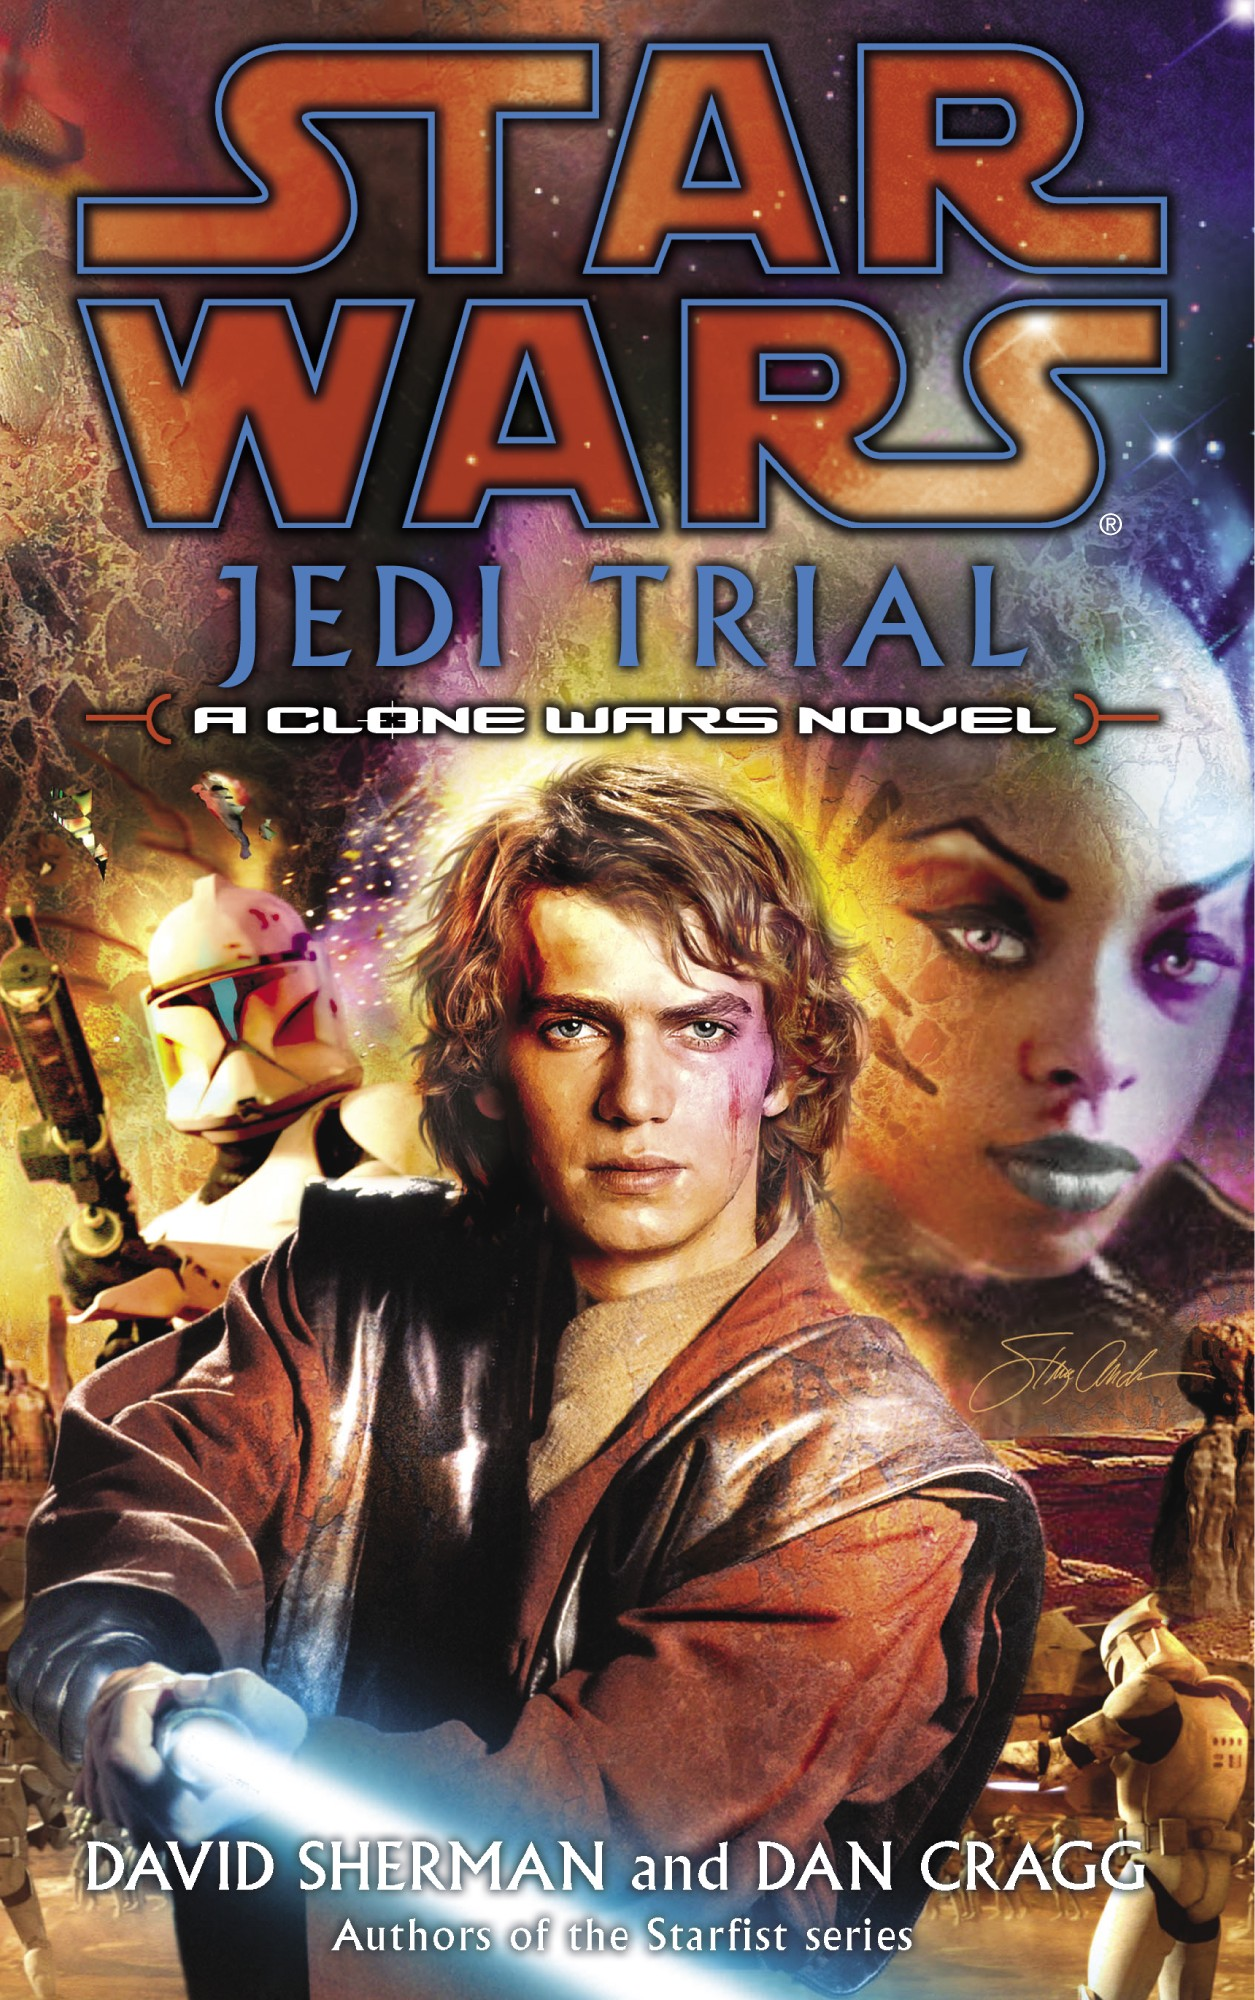 Star Wars: Jedi Trial (paperback)